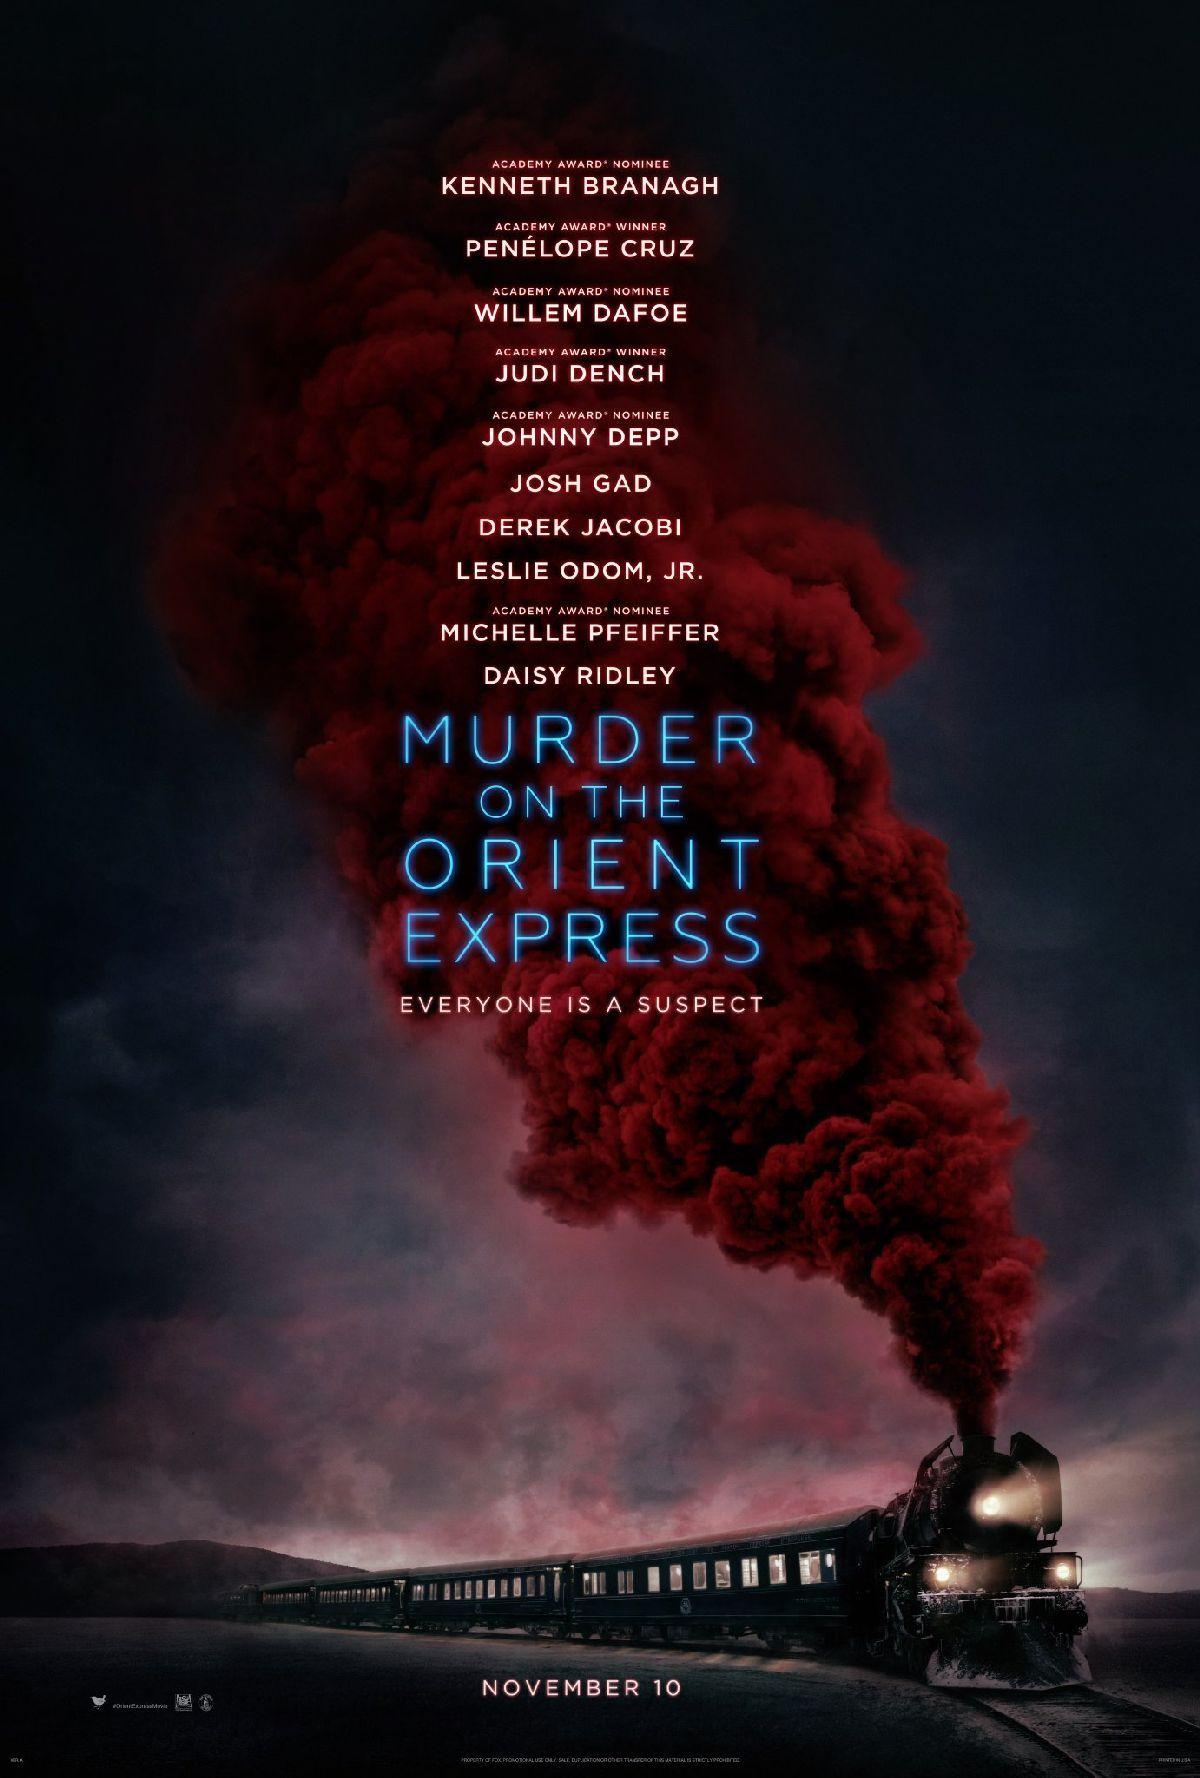 Murder-on-the-Orient-Express-poster-1.jpg